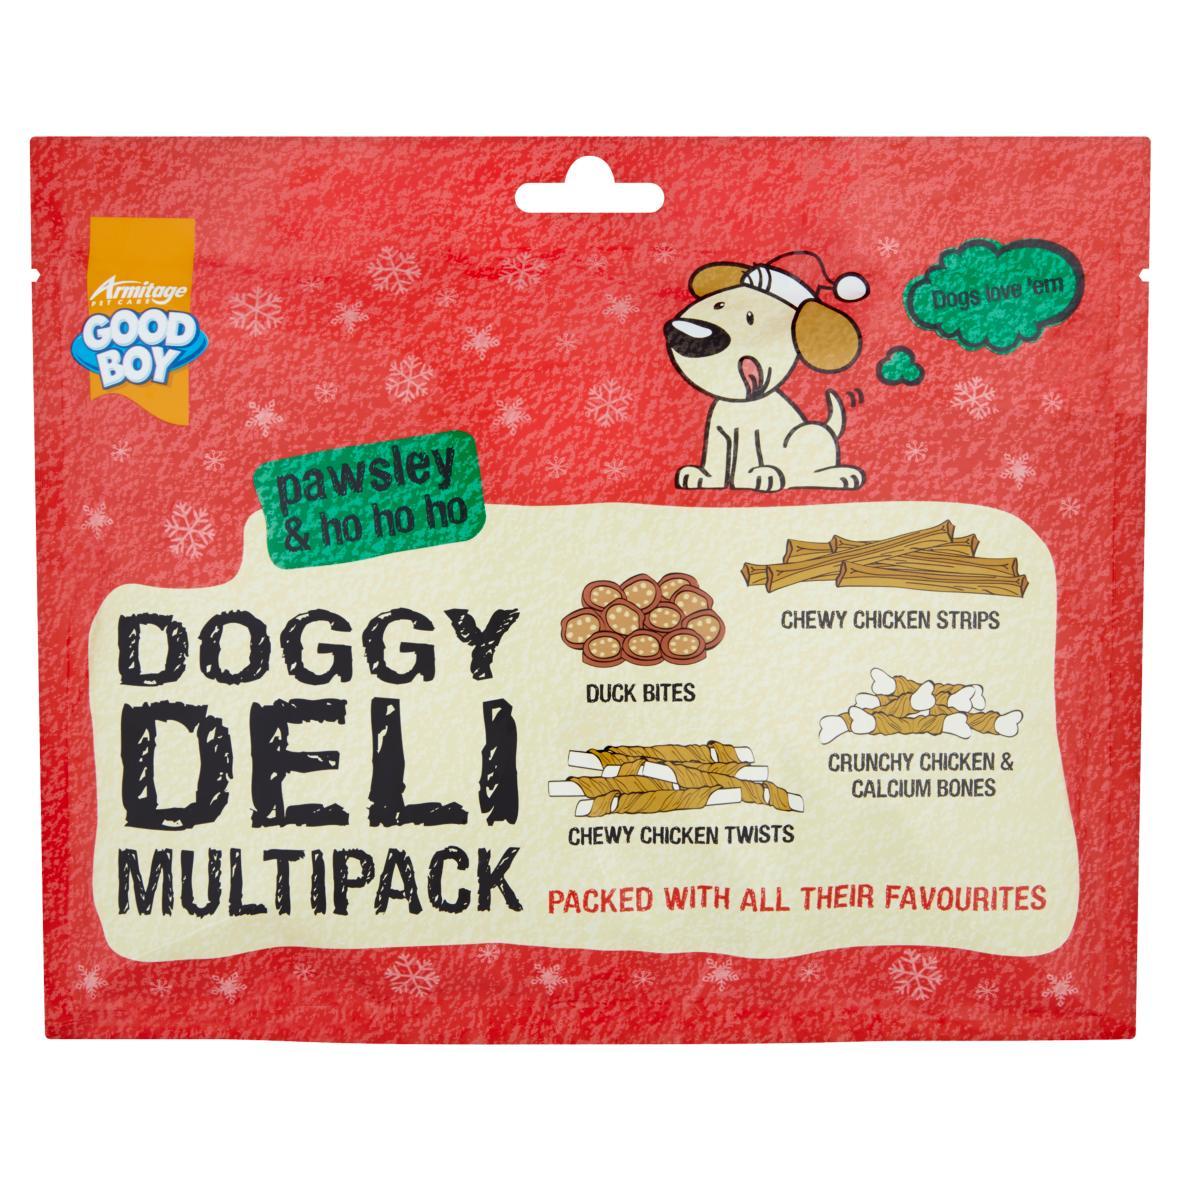 Good Boy Doggy Deli Multipack 166gm